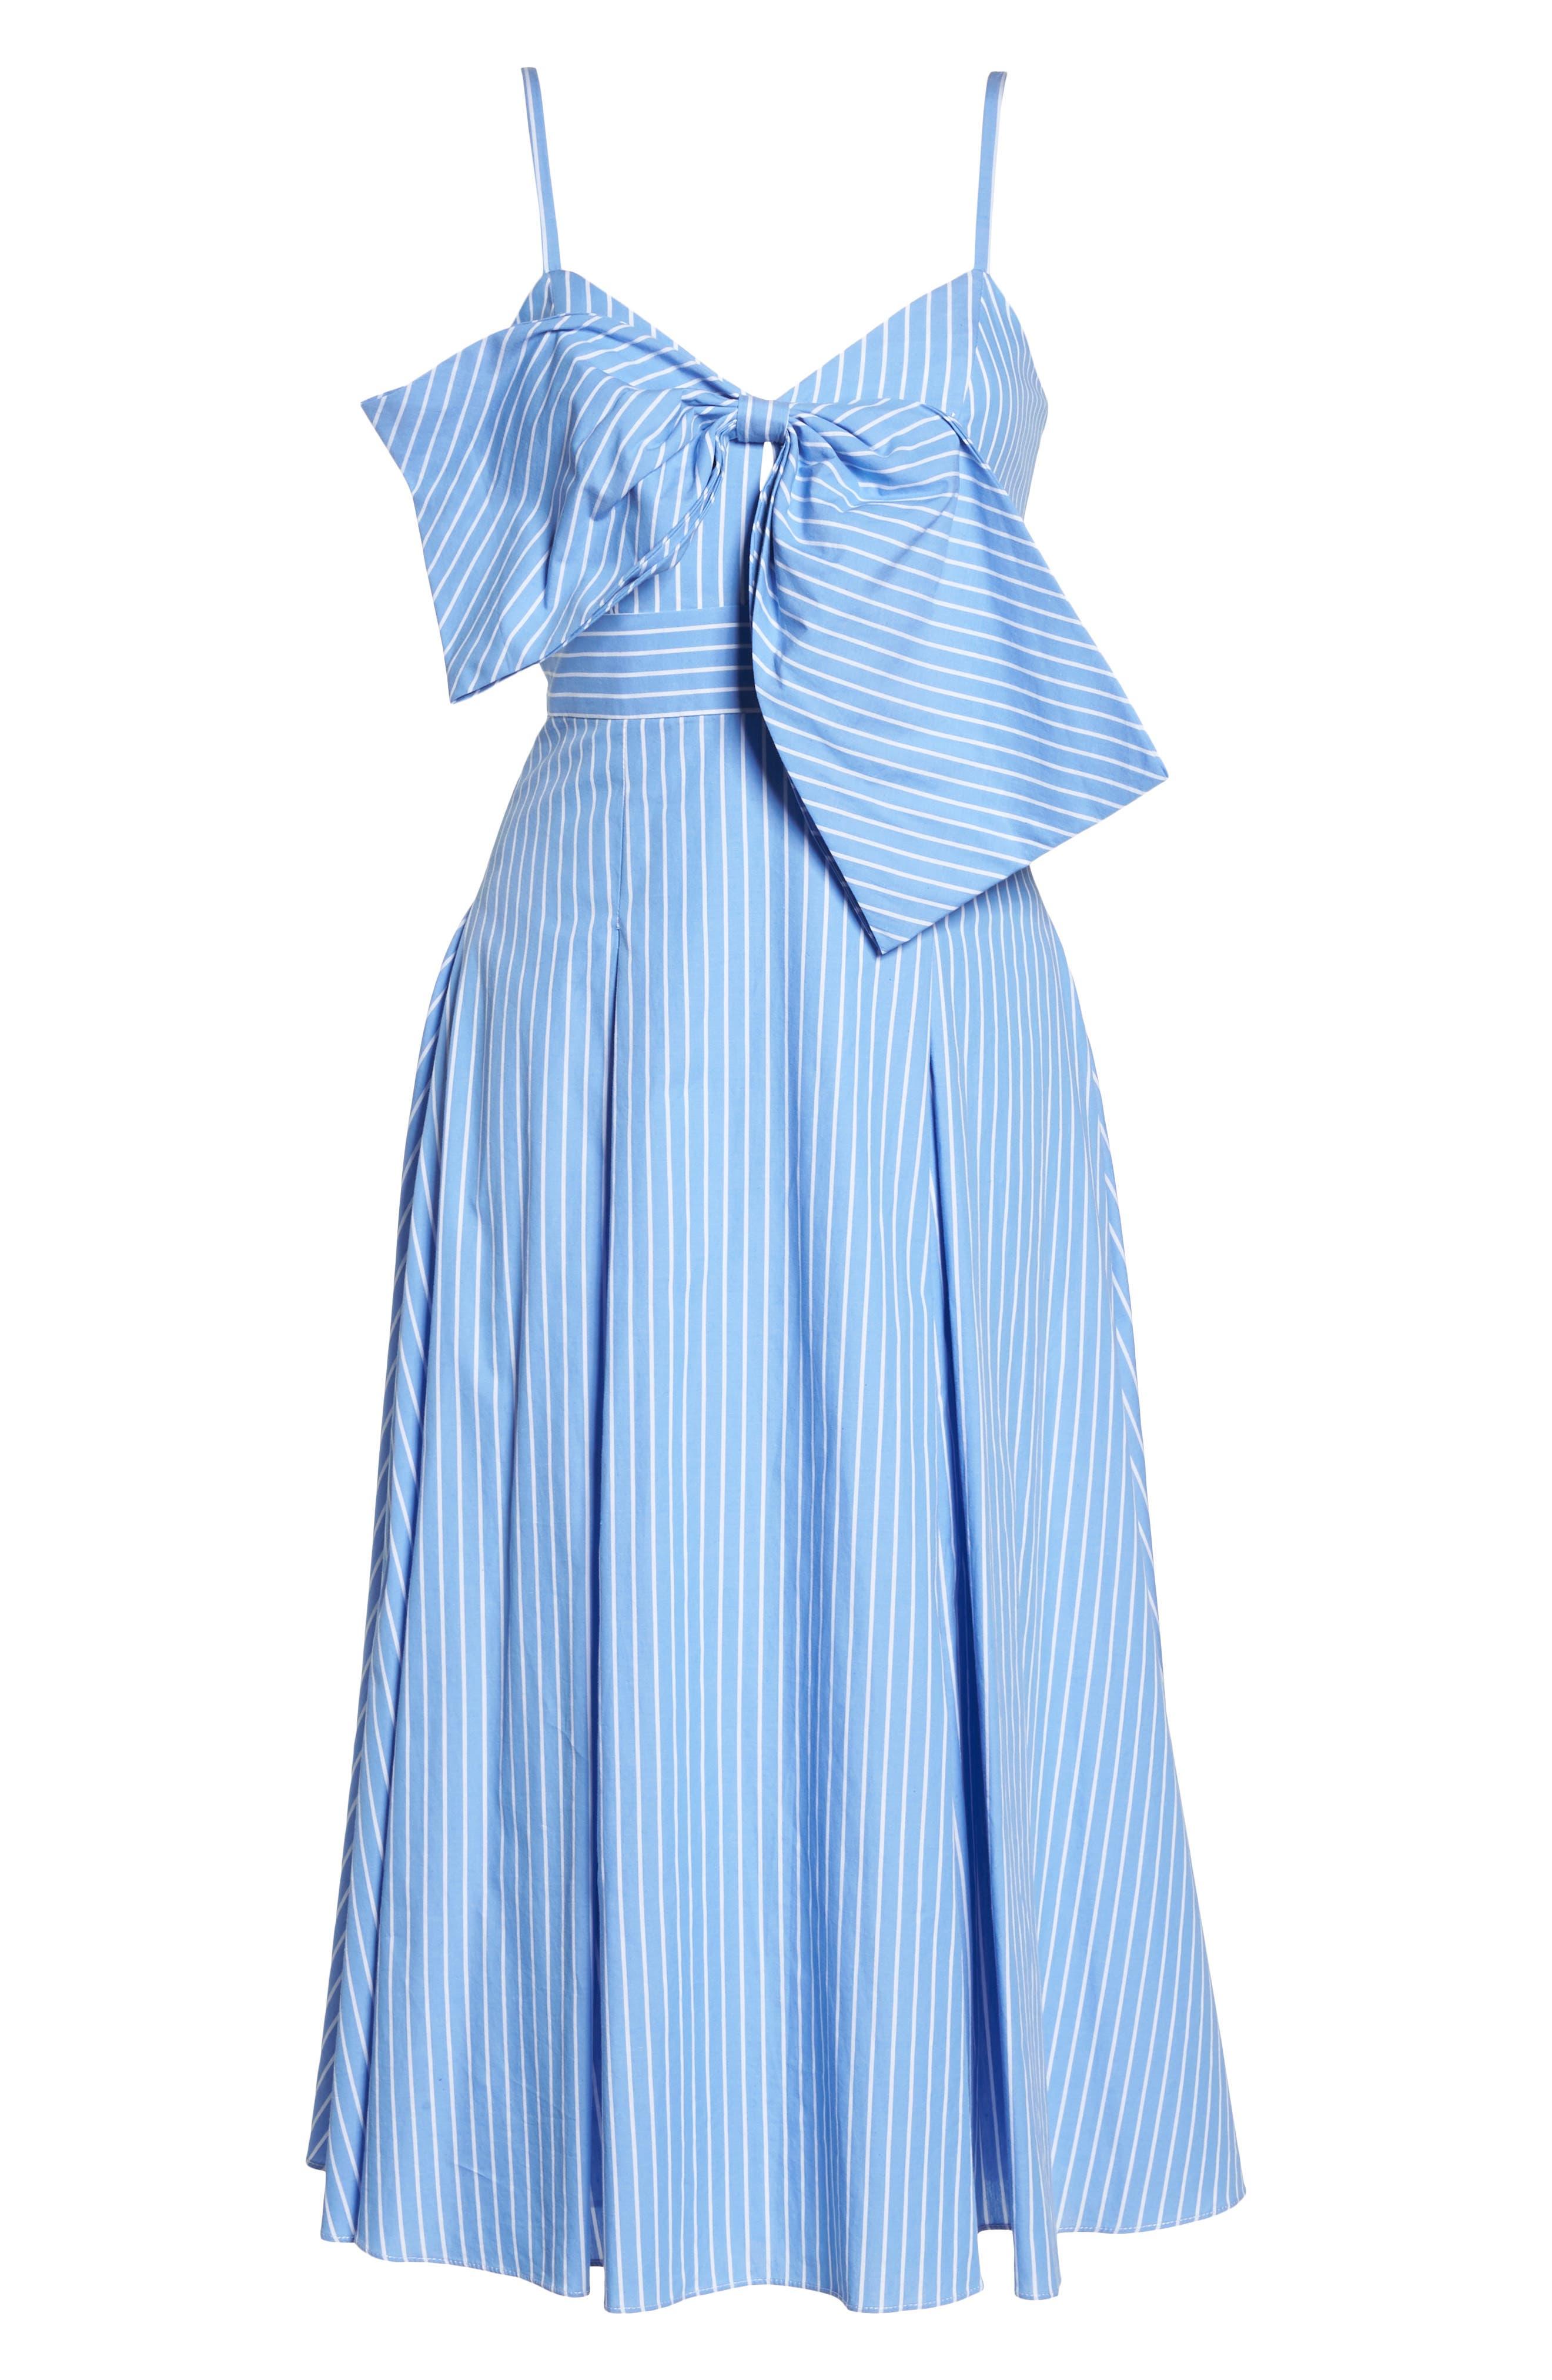 Becky Bow Front Tea Length Dress,                             Alternate thumbnail 7, color,                             450